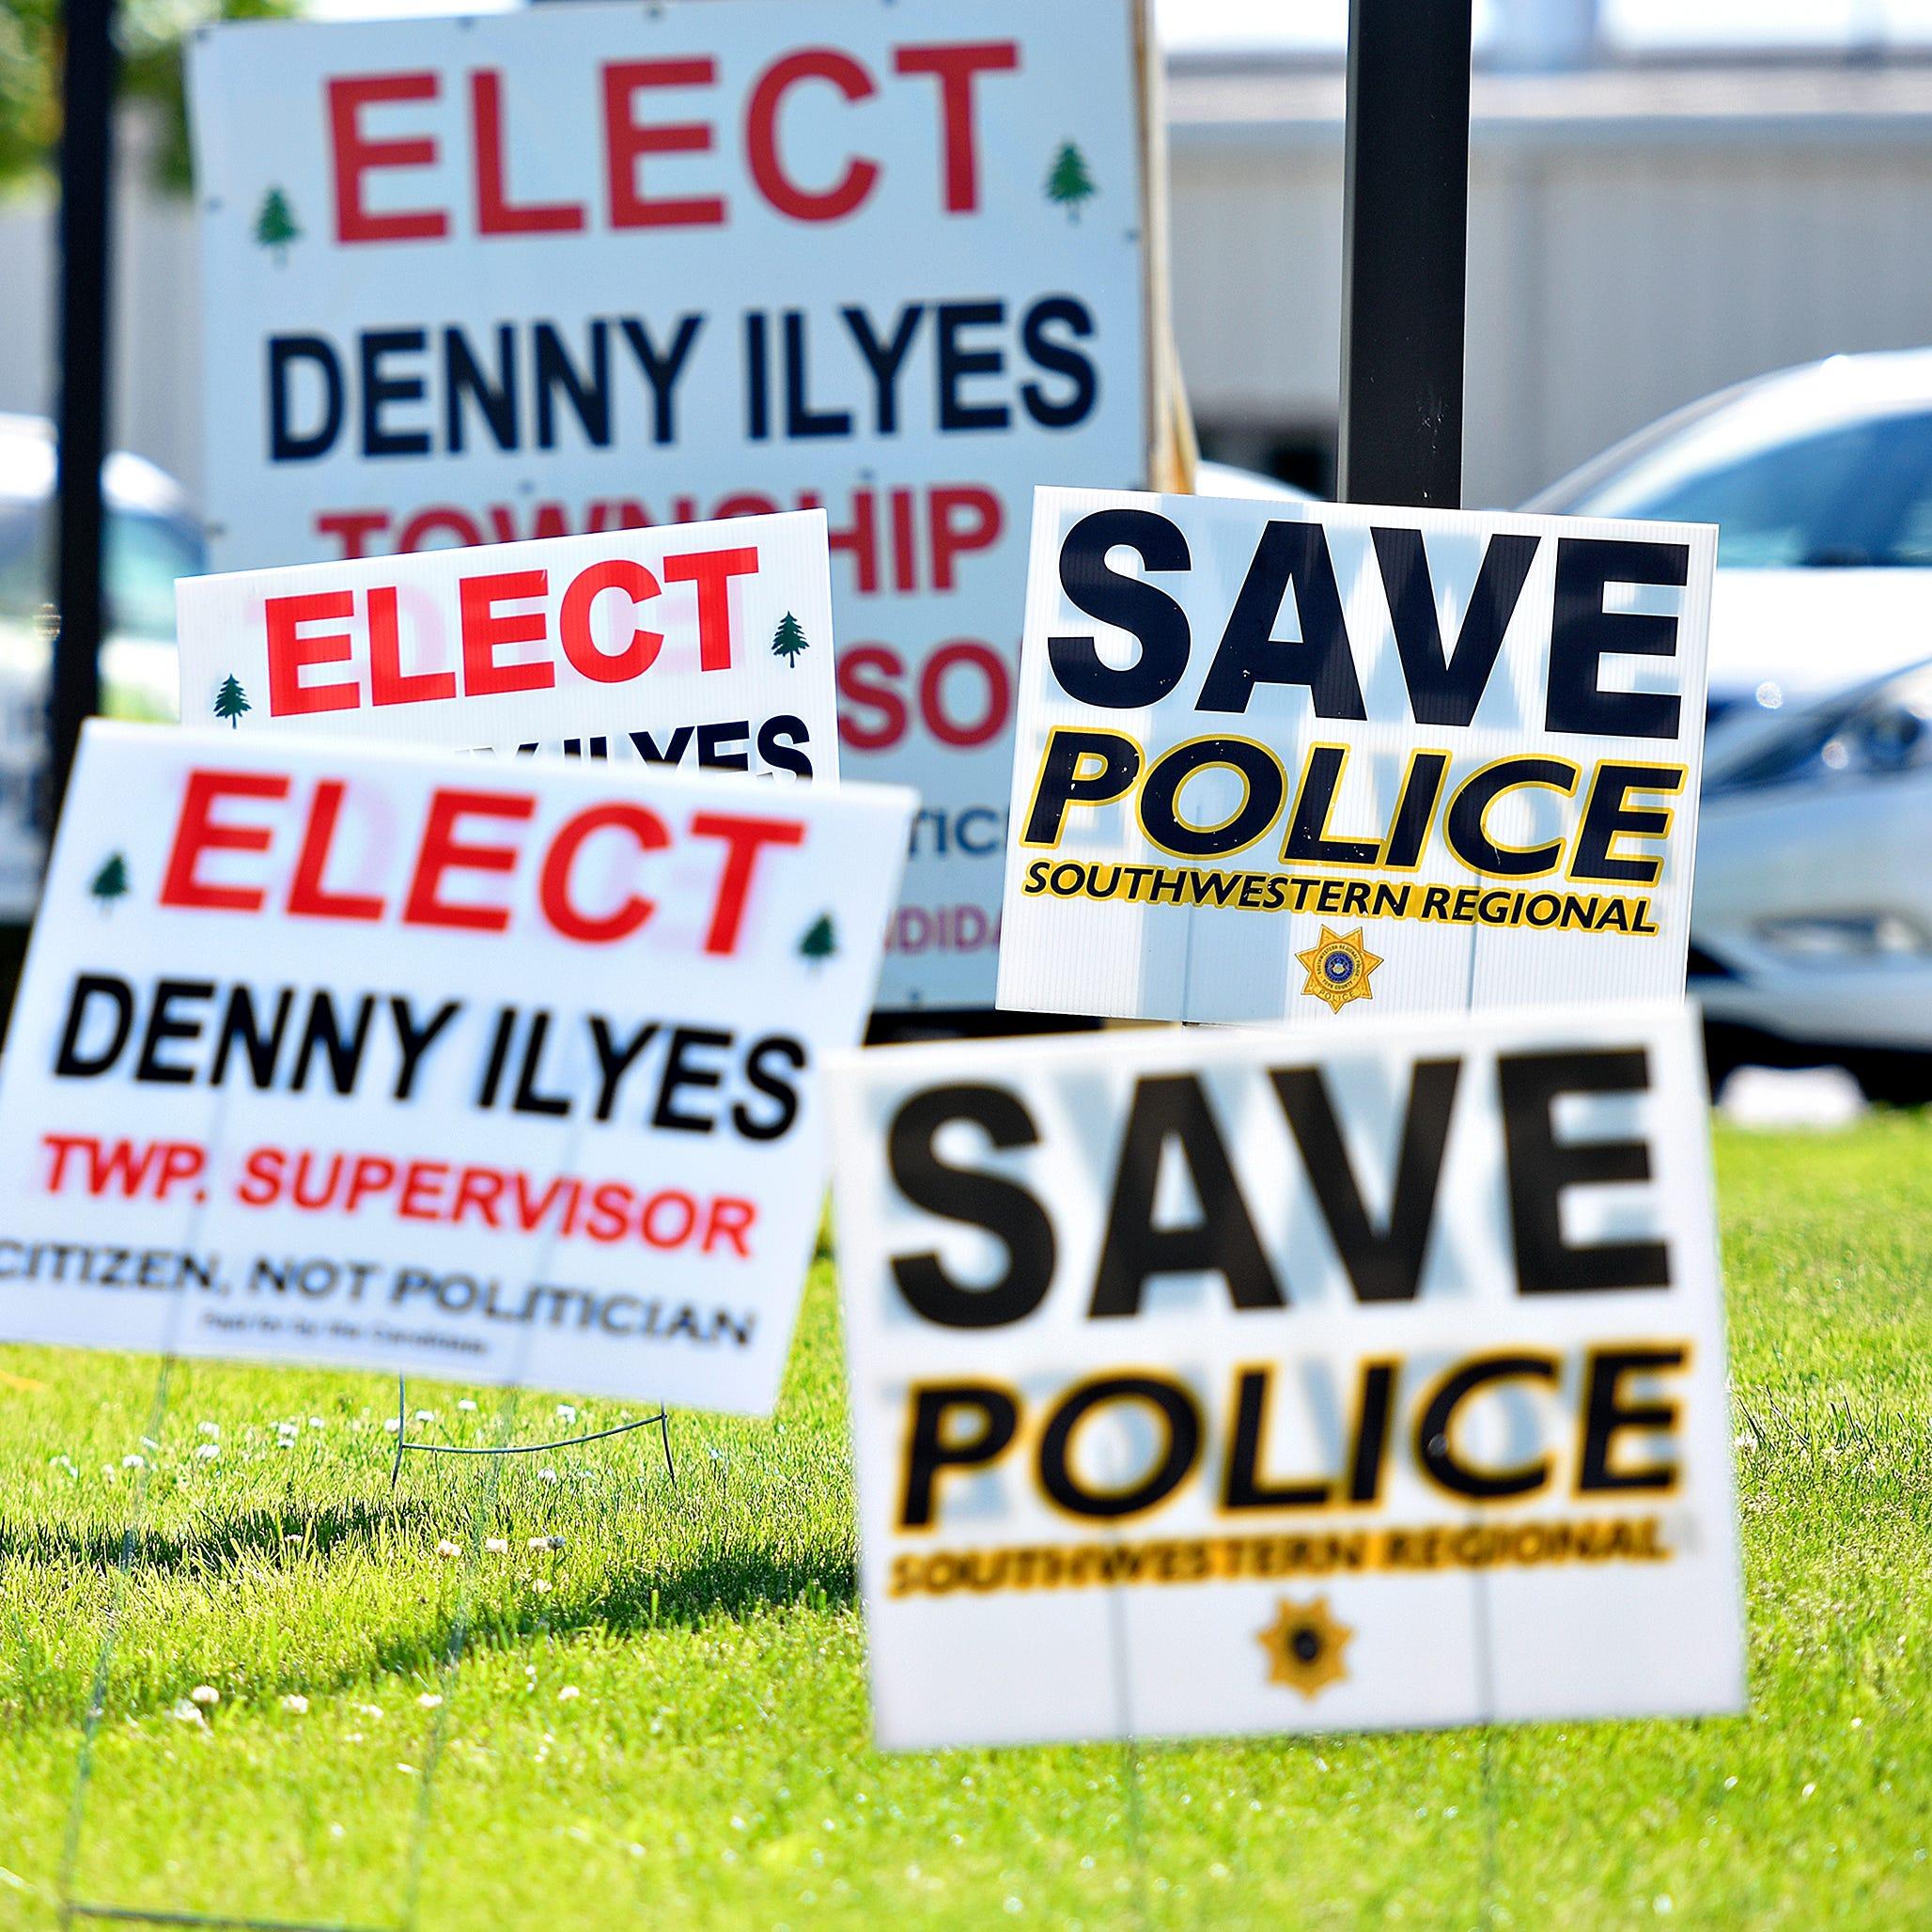 Primary Election Day at Genesis Church, Ward 1, in North Codorus Township, Tuesday, May 21, 2019. Dawn J. Sagert photo